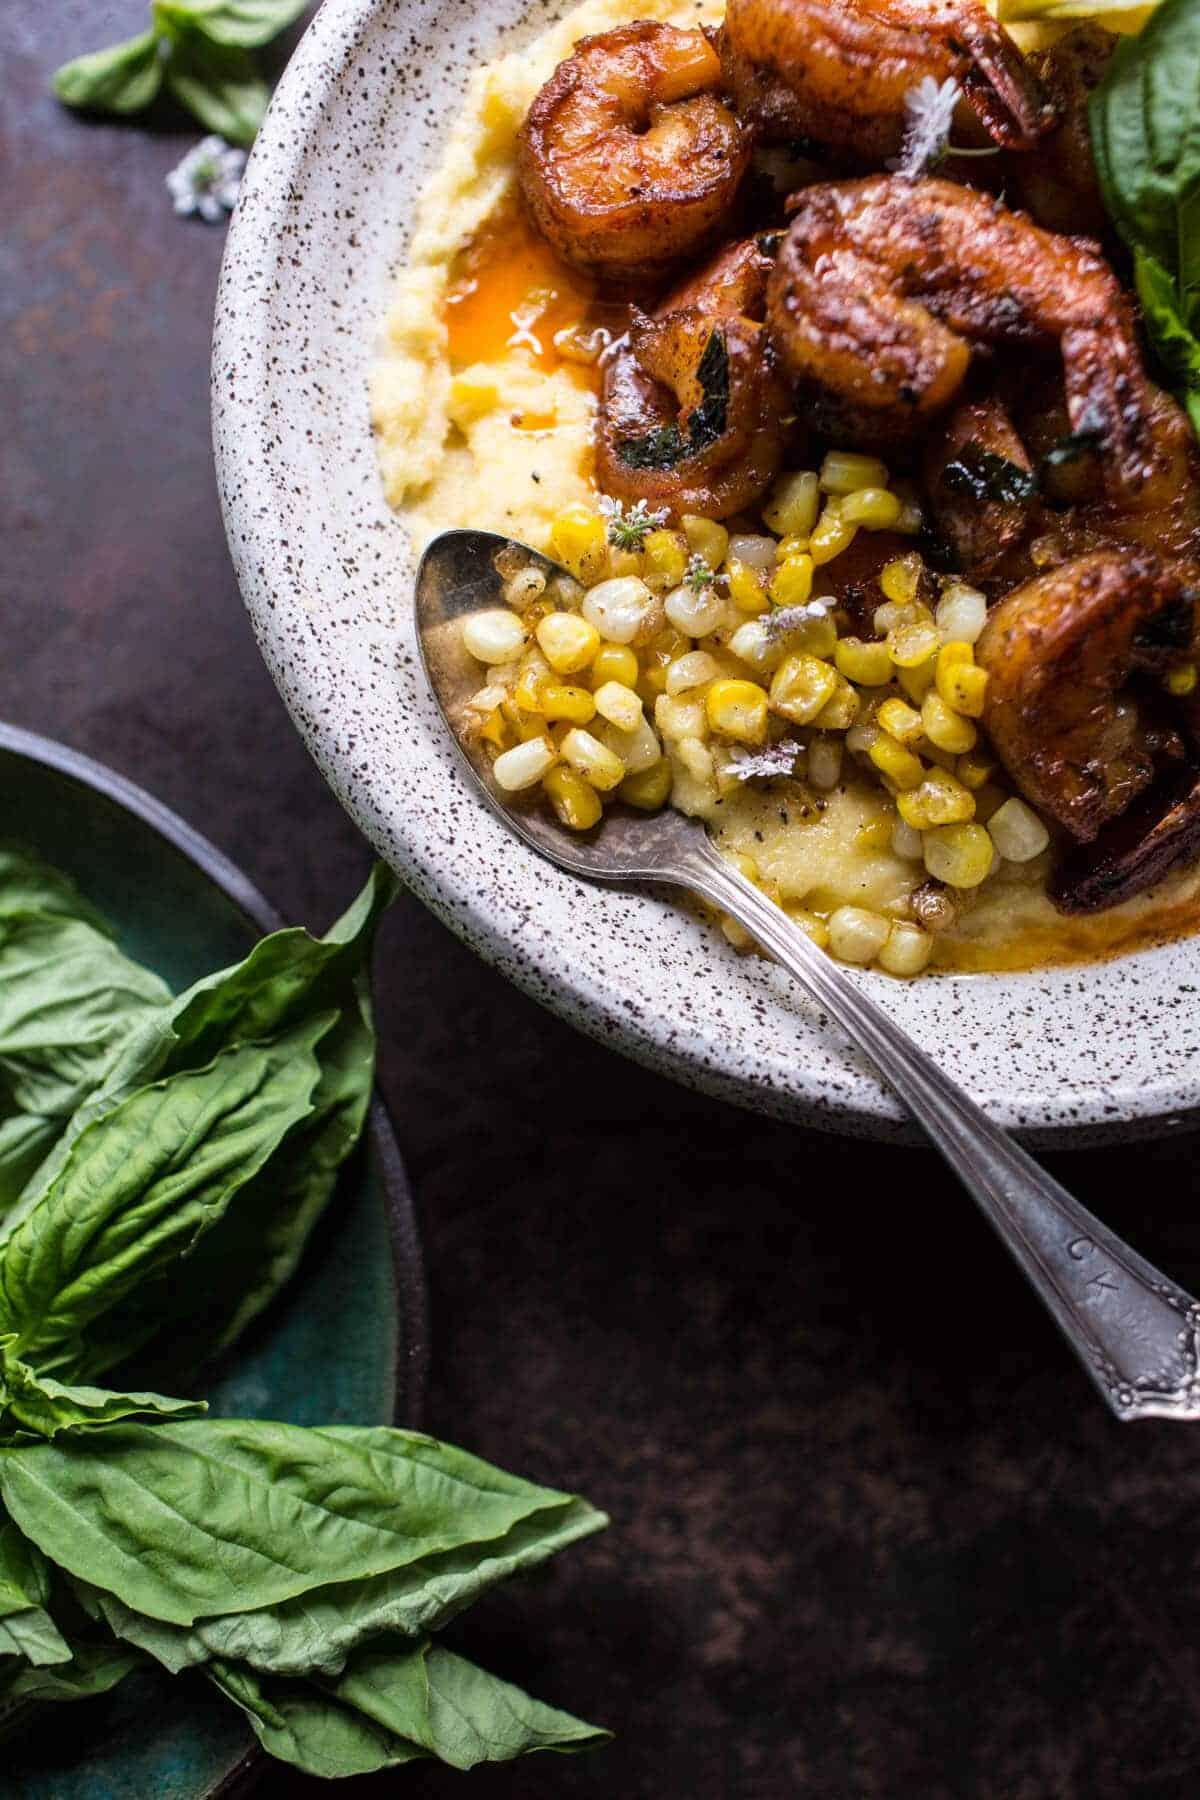 Cajun Garlic Lemon Butter Shrimp with Caramelized Corn Polenta | halfbakedharvest.com @hbharvest